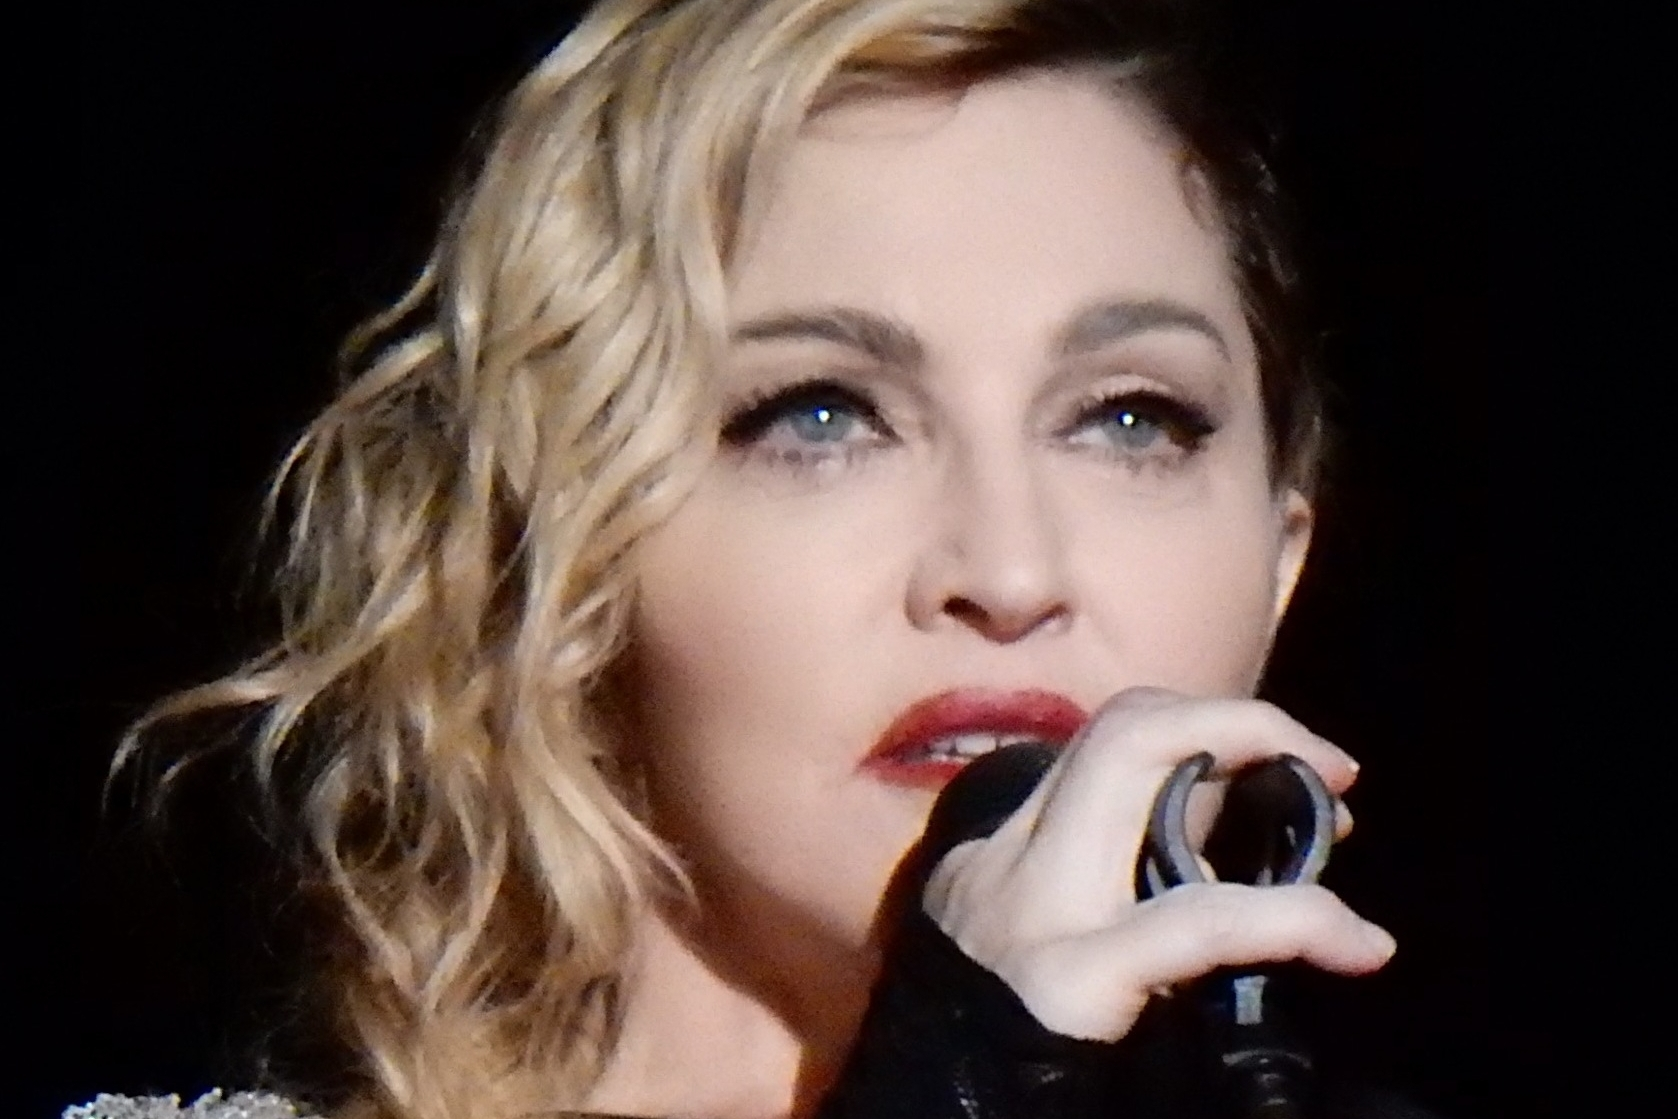 Билеты на «Евровидение» подорожали в 3 раза из-за Мадонны